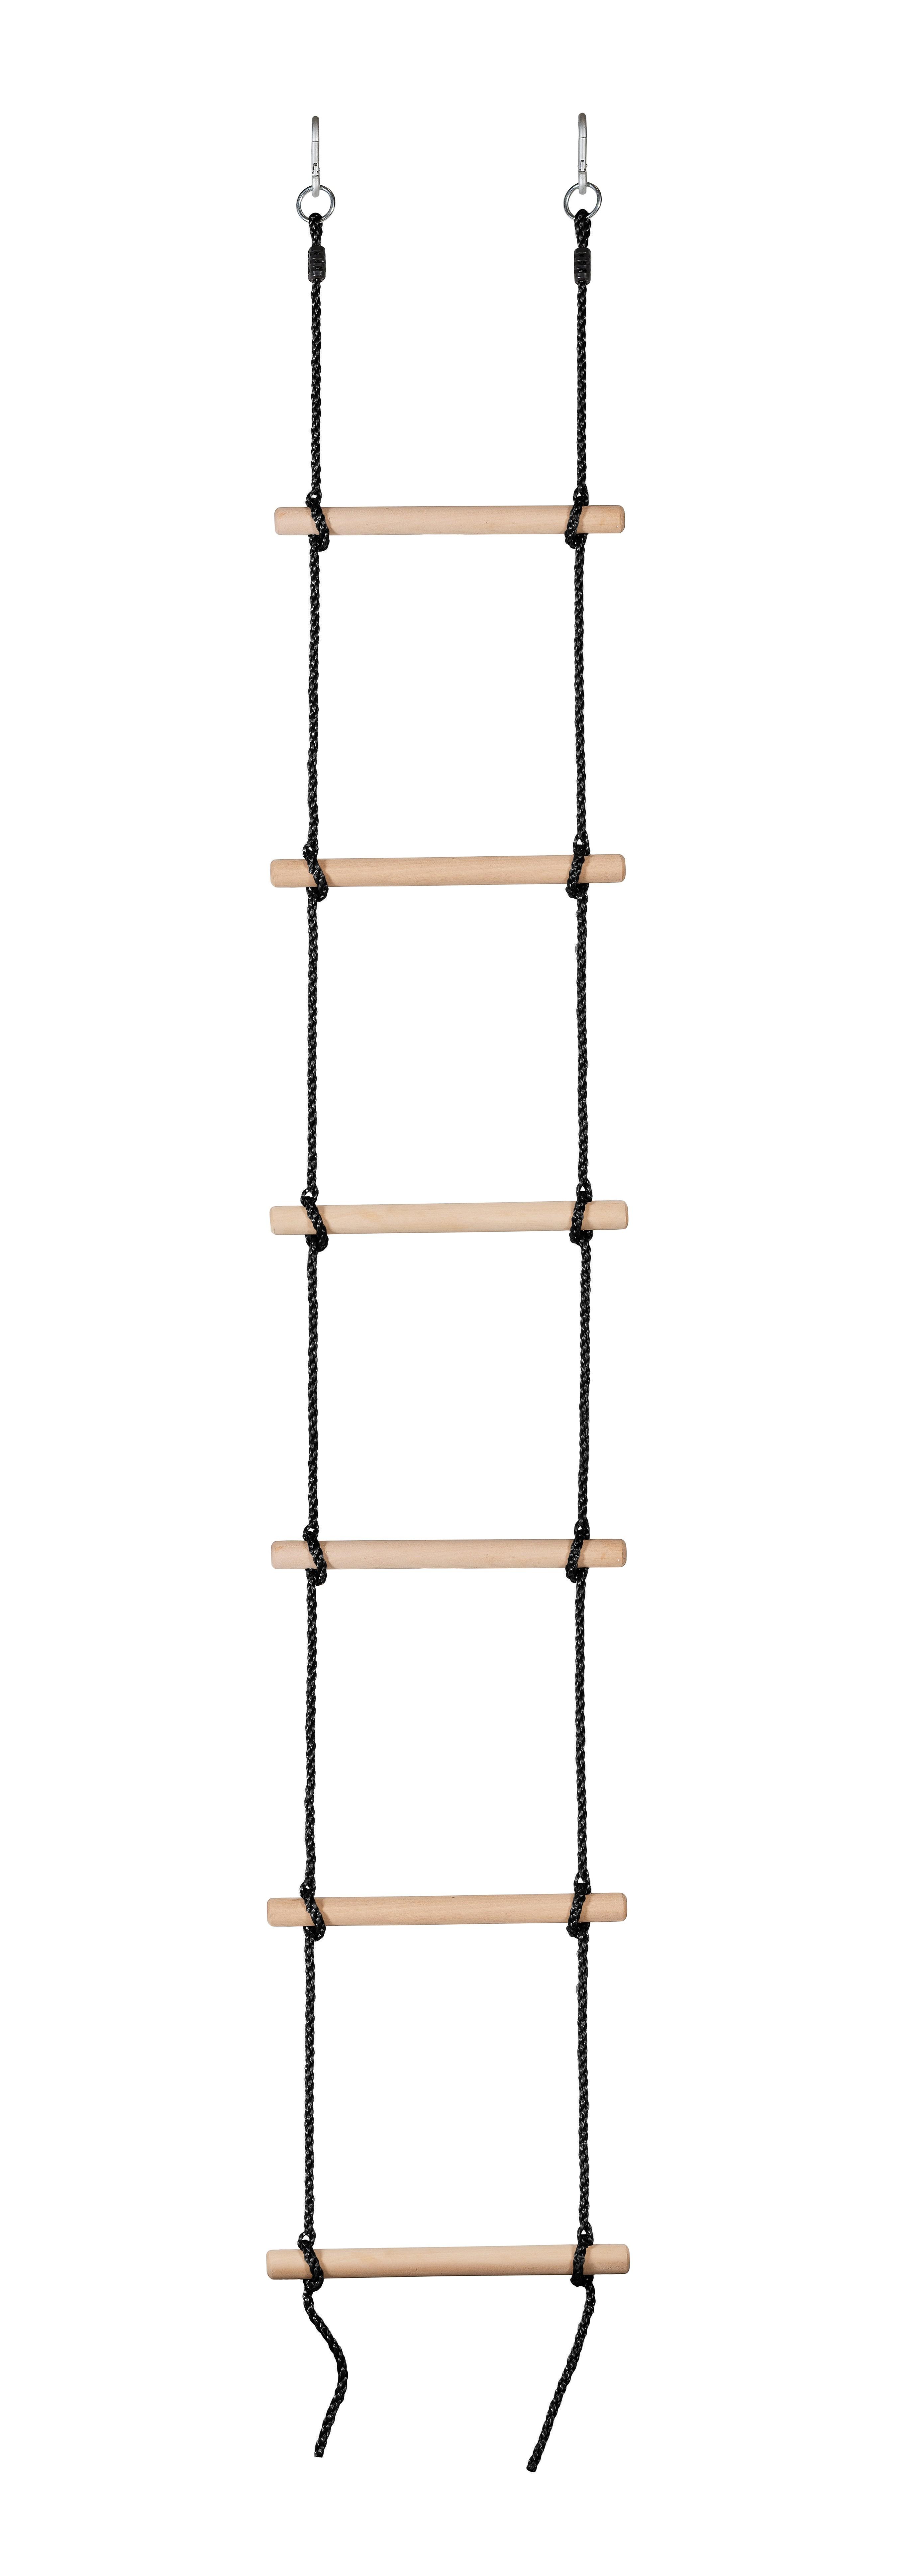 Swingan - 6 Steps Gymnastic Climbing Rope Ladder - Fully Assembled - Black Rope